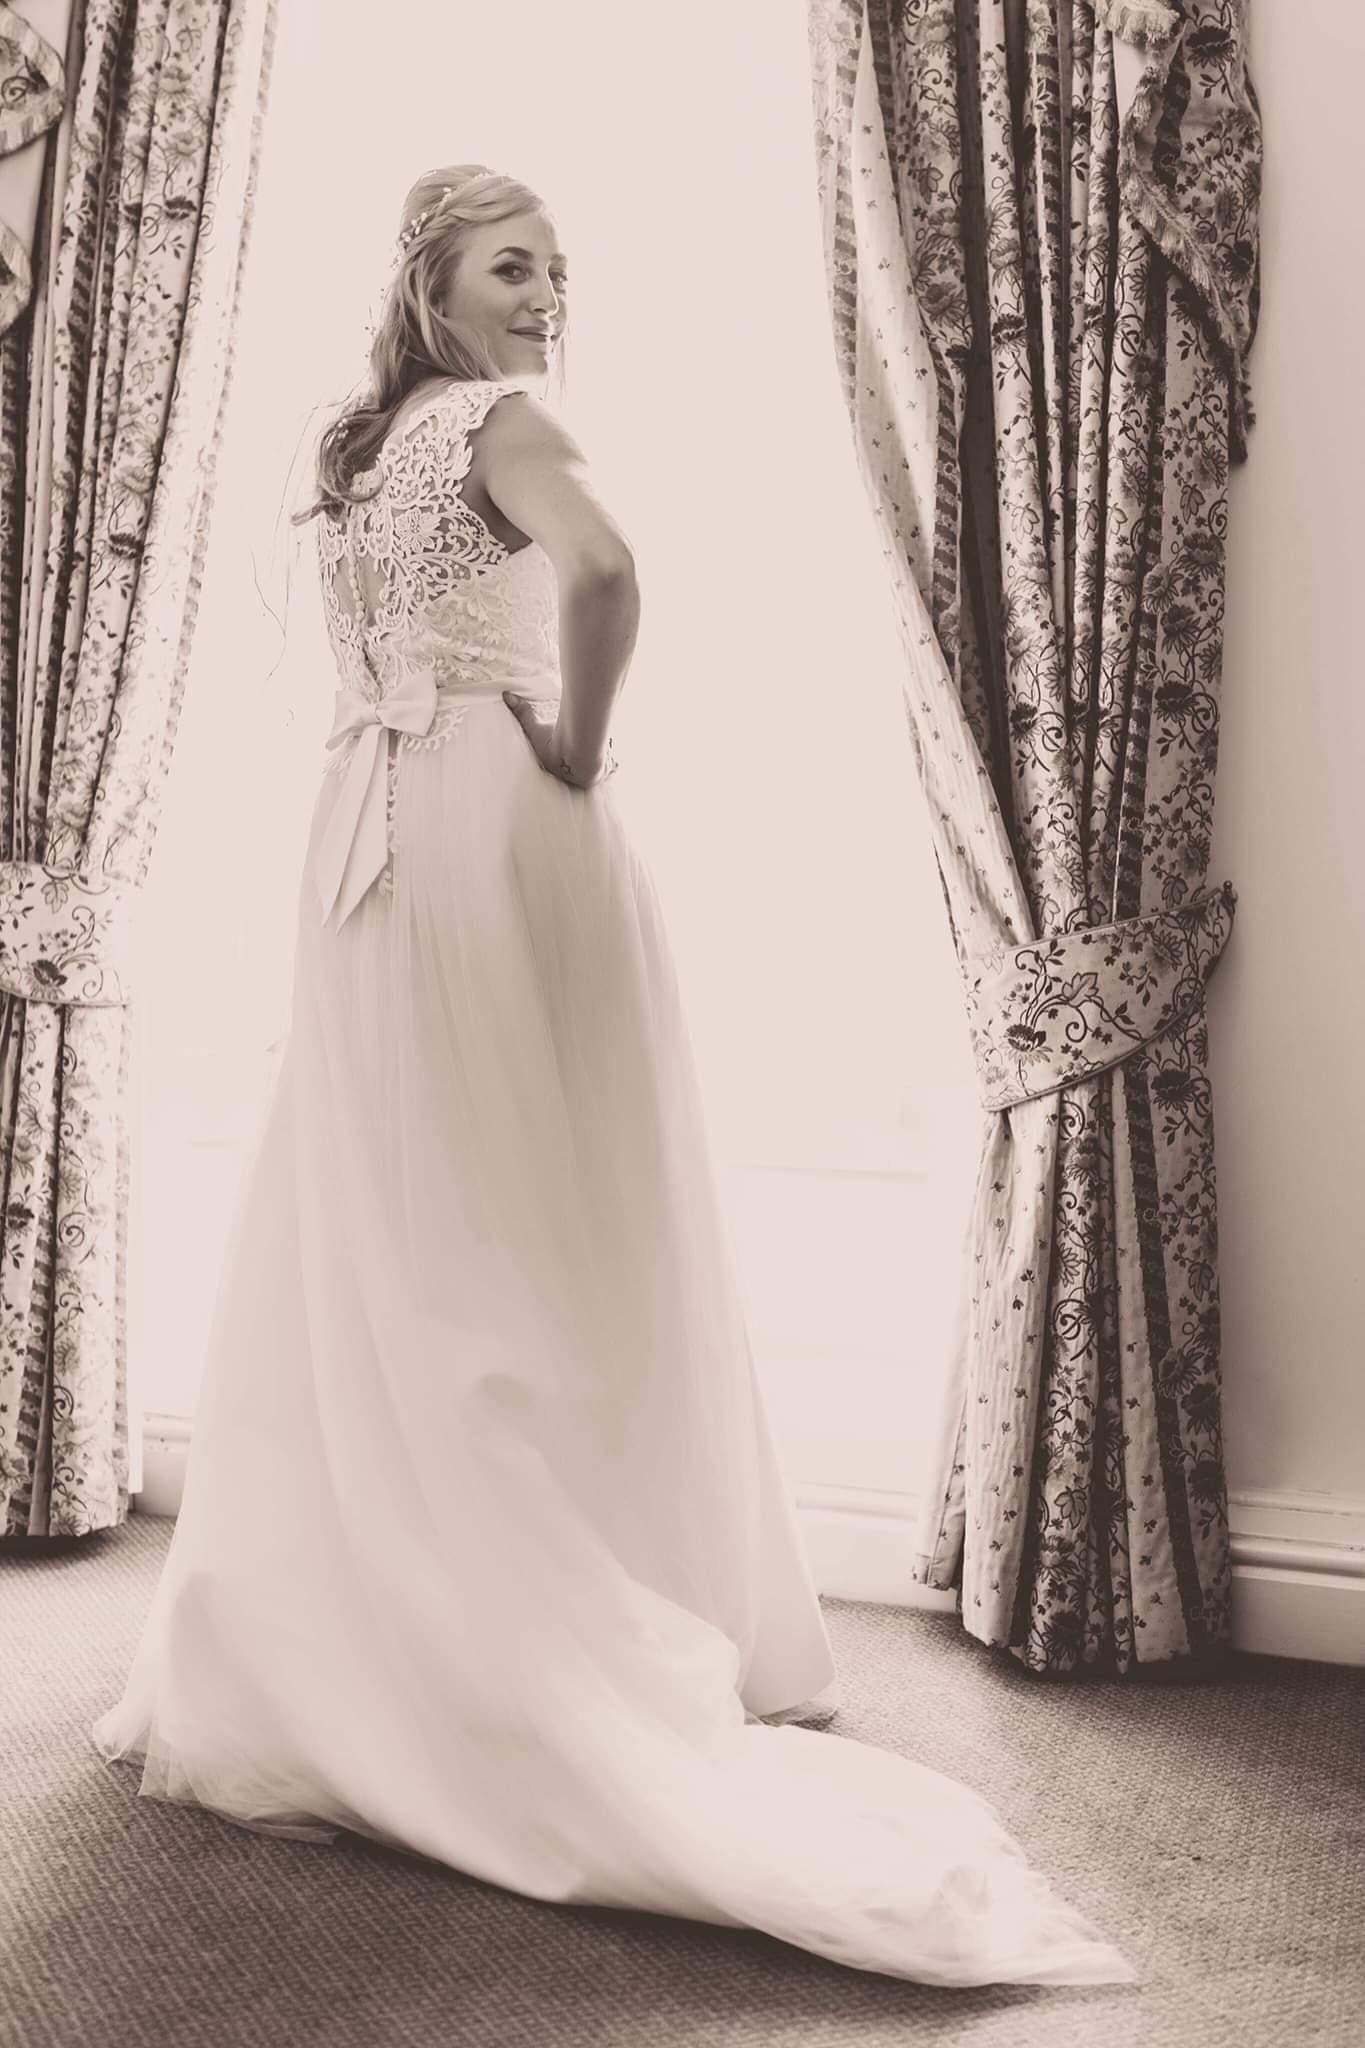 Jodie in a Verise gown